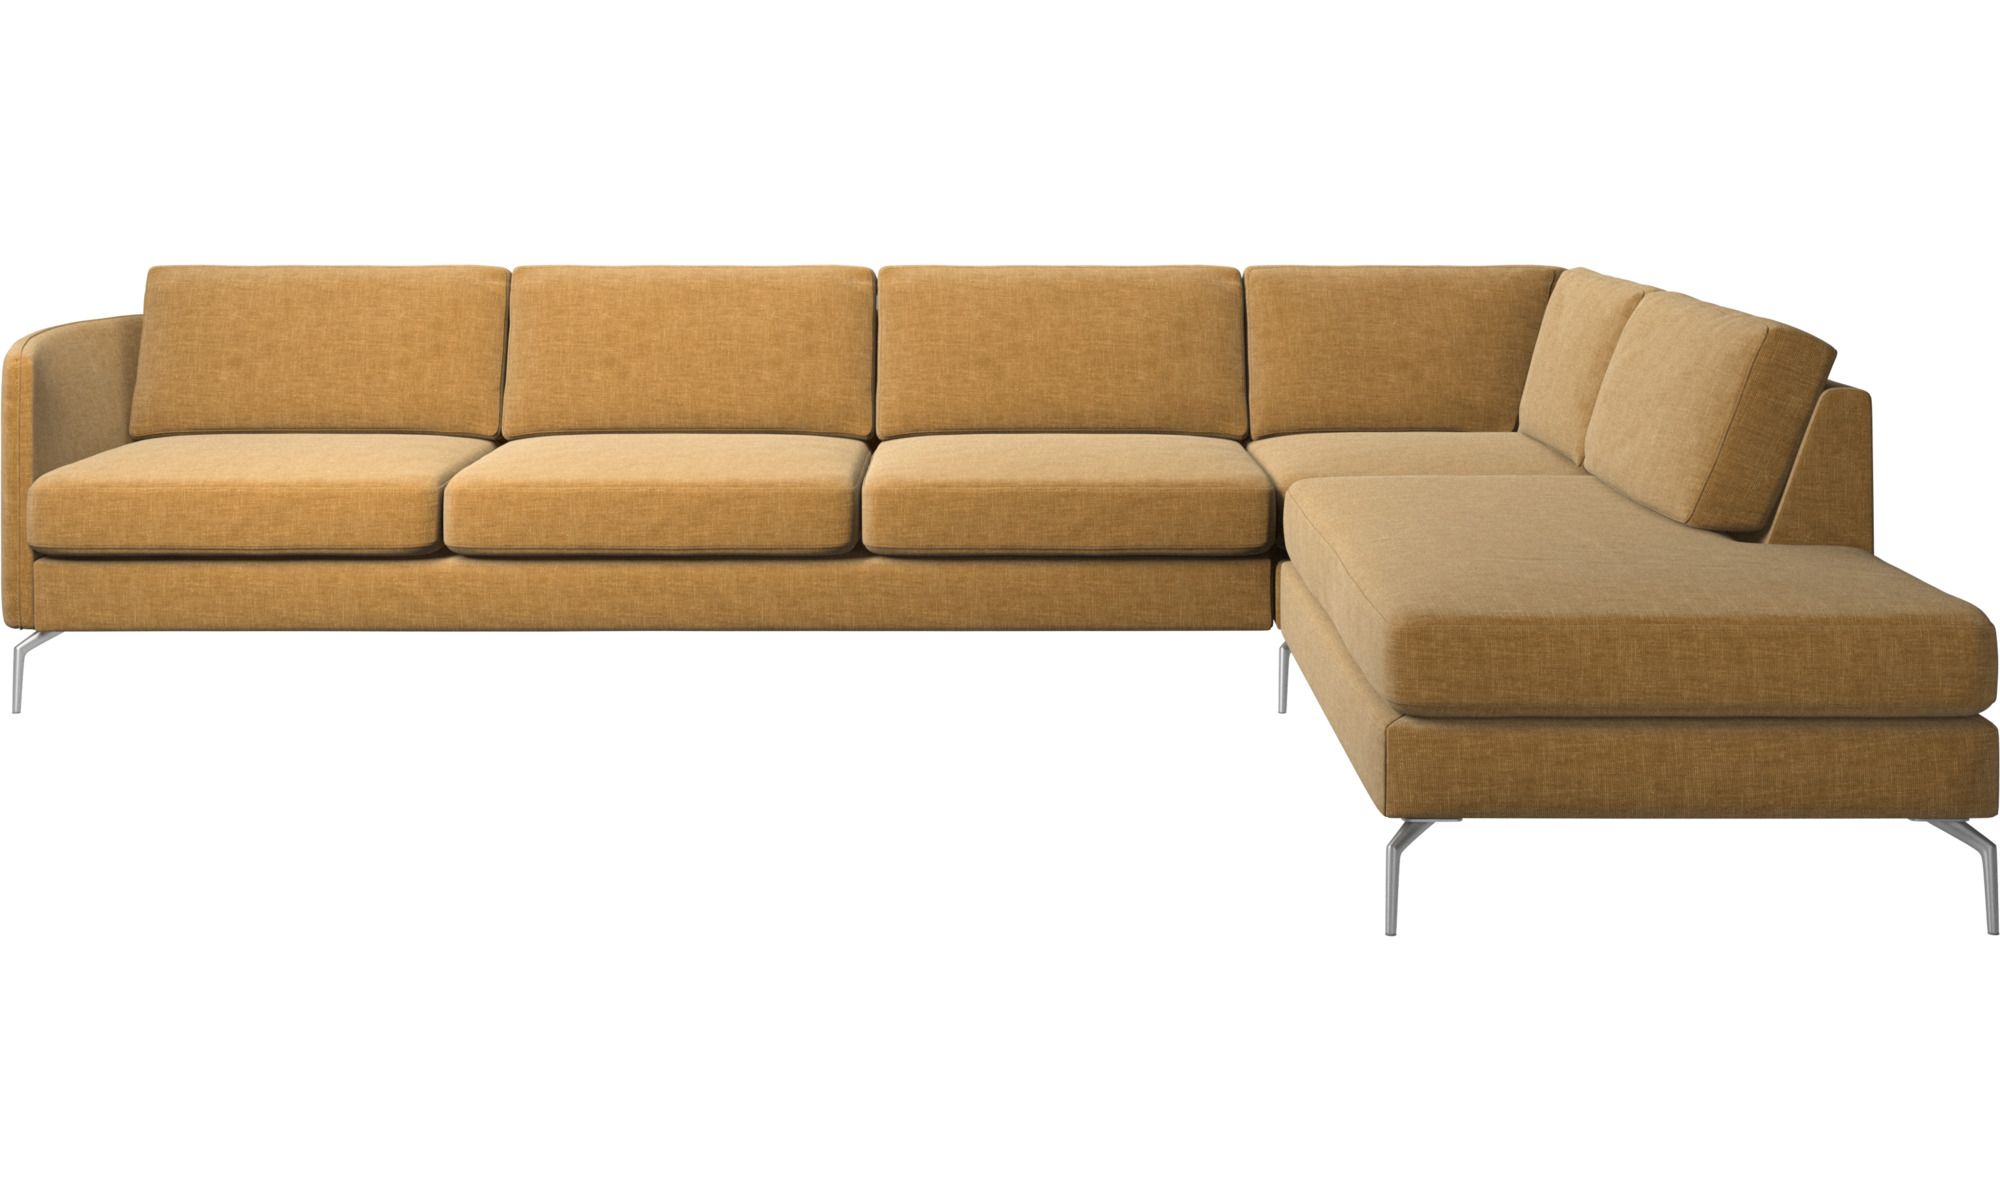 Canapé Avec Canapés D'angle MéridienneAssise Osaka 0ZOPXNnwk8